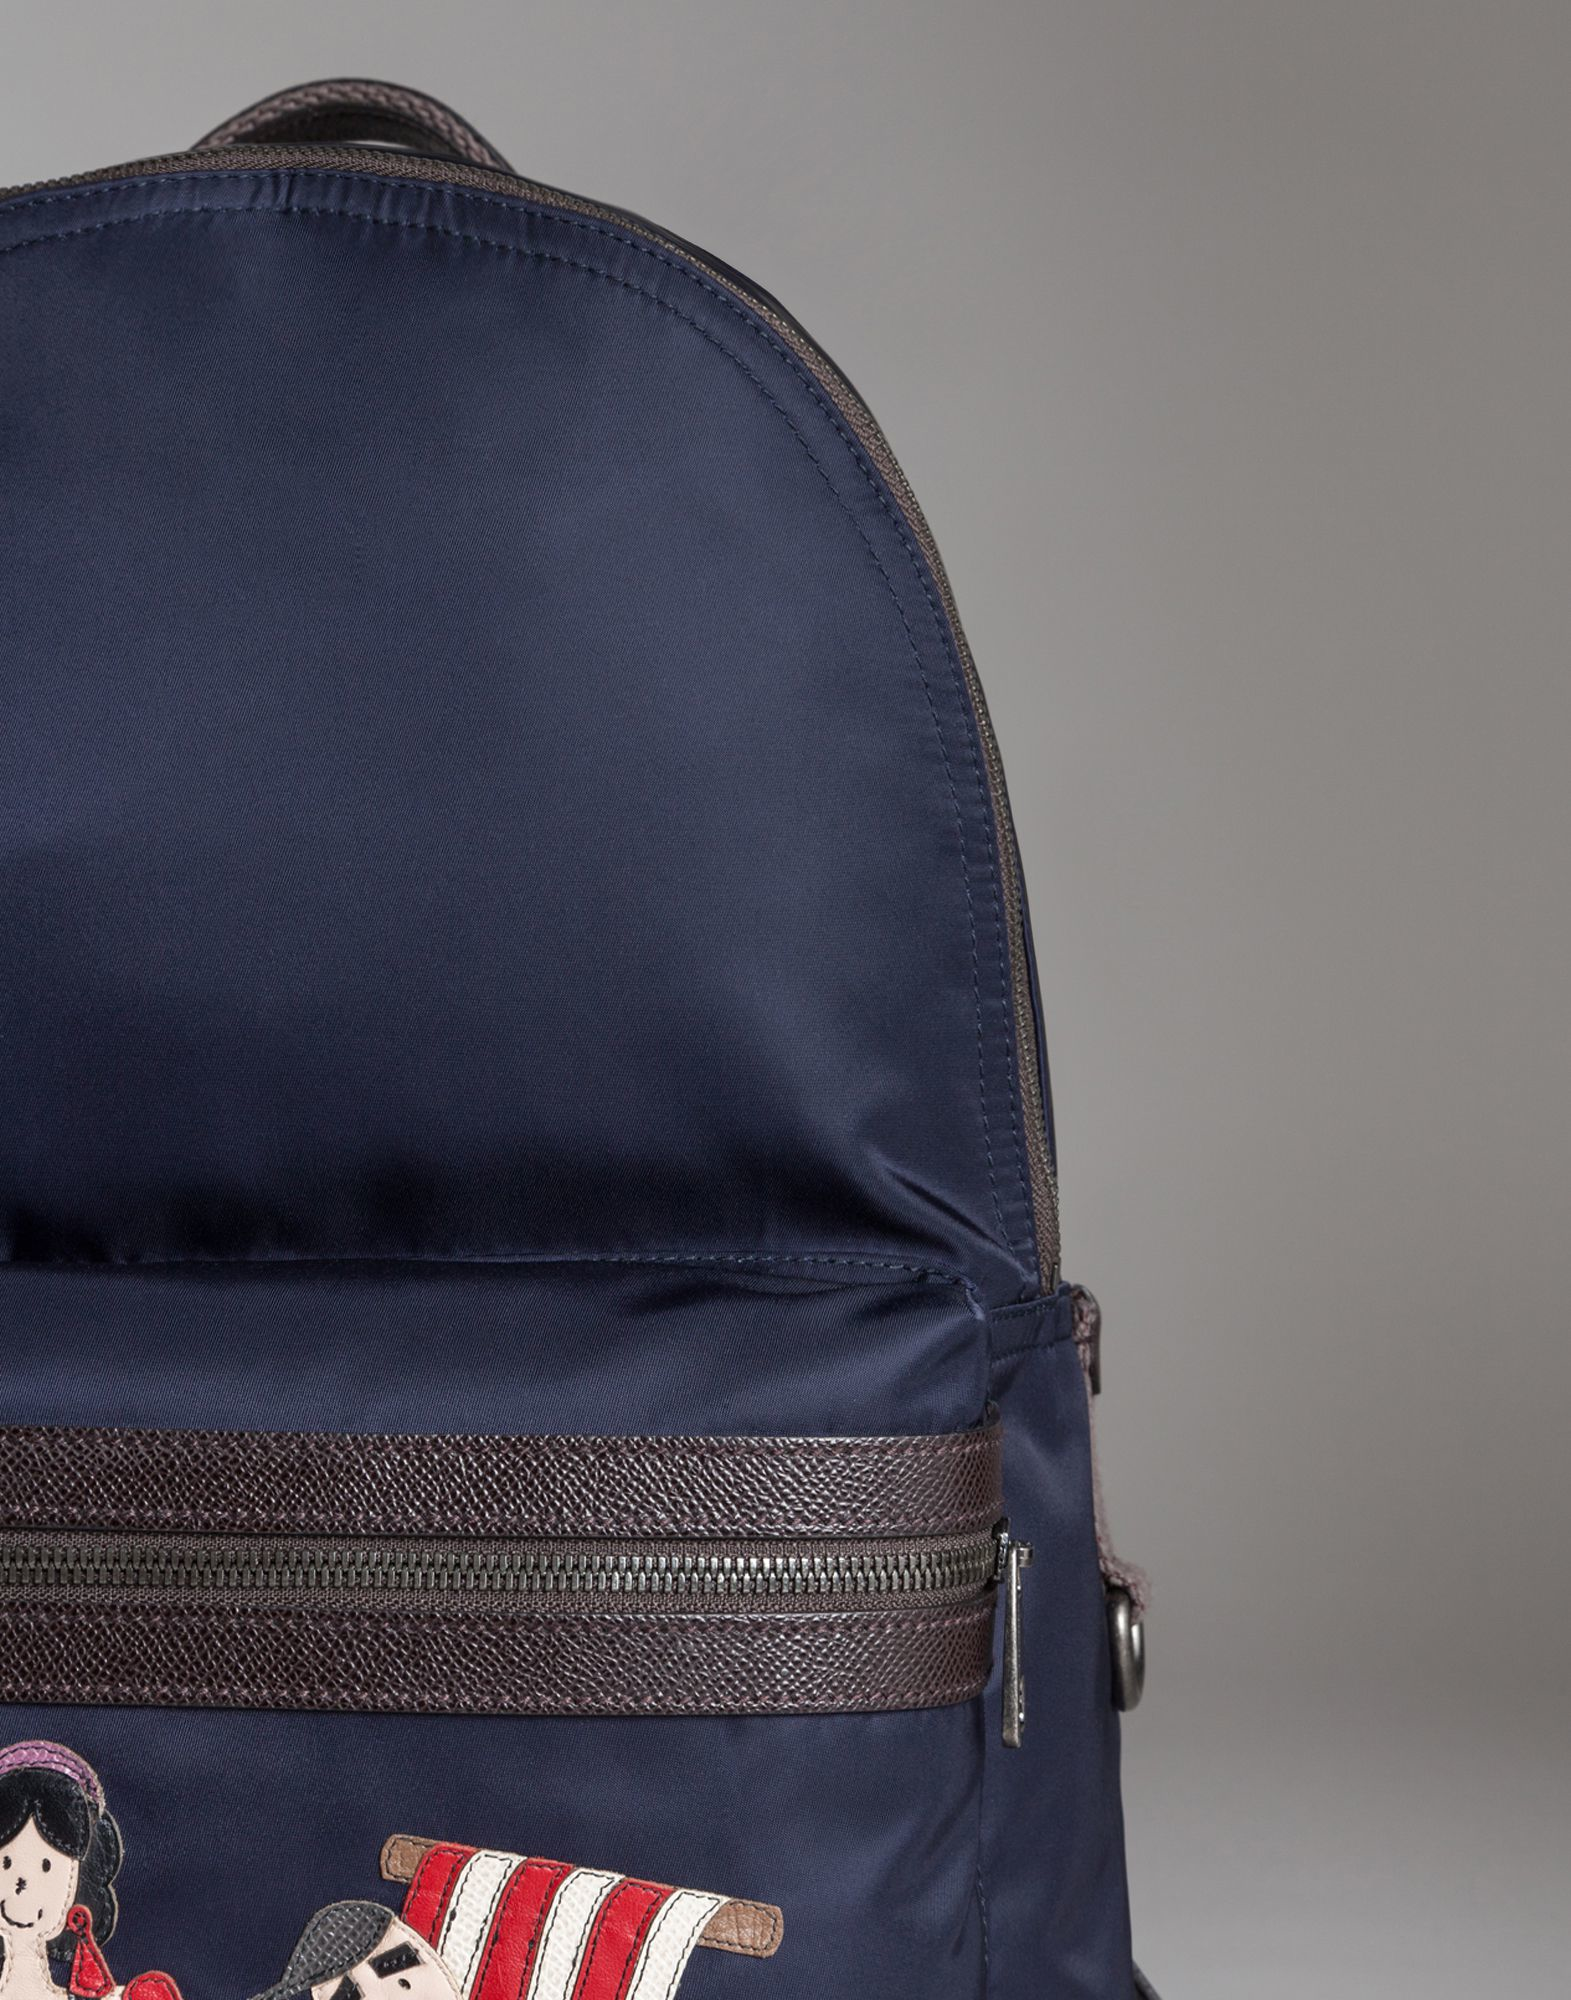 ... Lyst  sale retailer 65816 bcf96 Dolce Gabbana Vulcano Backpack In Nylon  With Appliqués in Blue for Men ... 9680d7e4c8